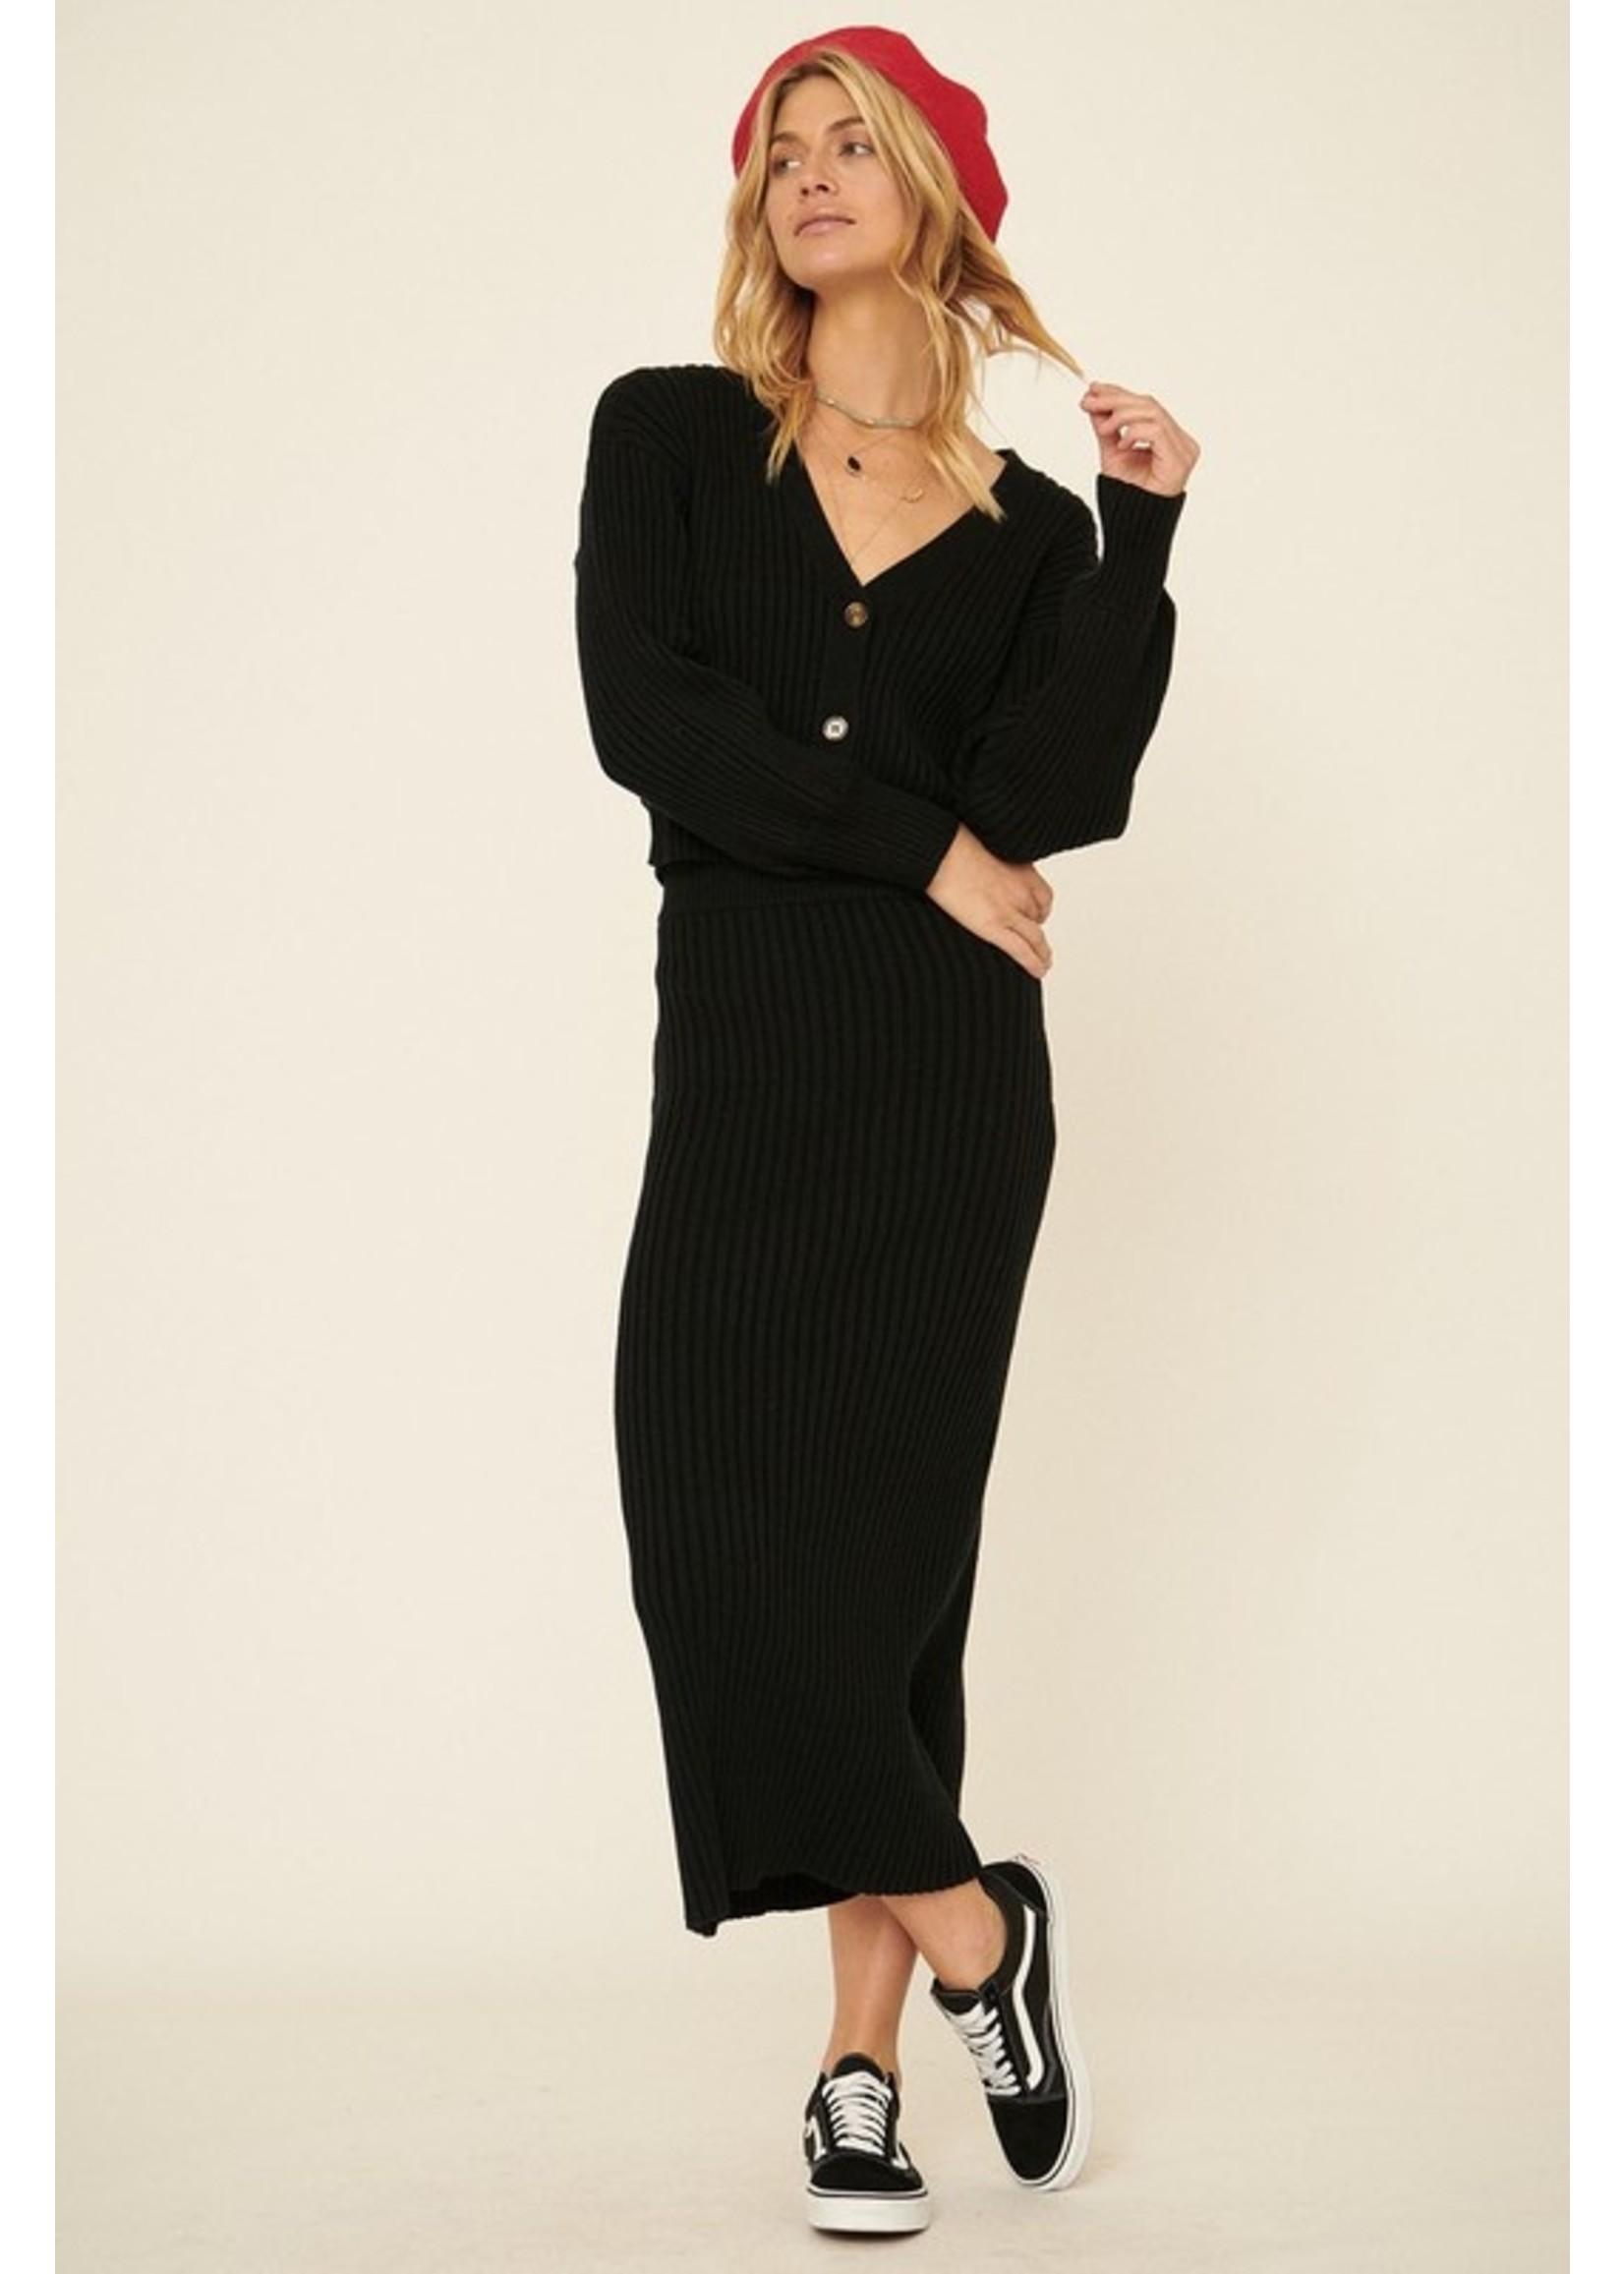 Promesa USA Keeping You Warm Maxi Skirt Black